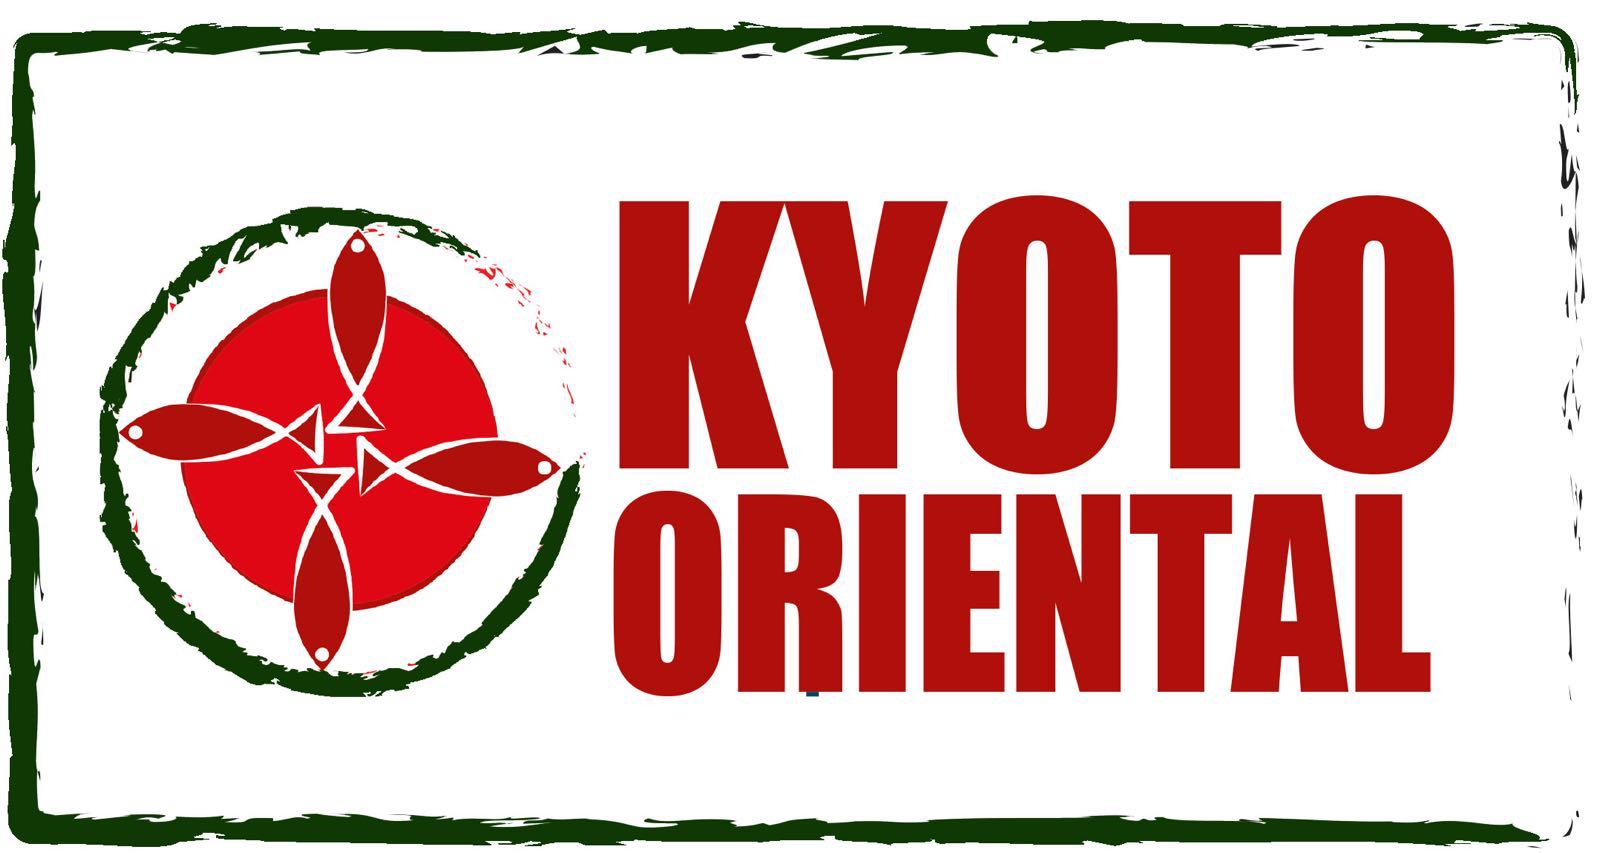 Kyoto Oriental Salitre